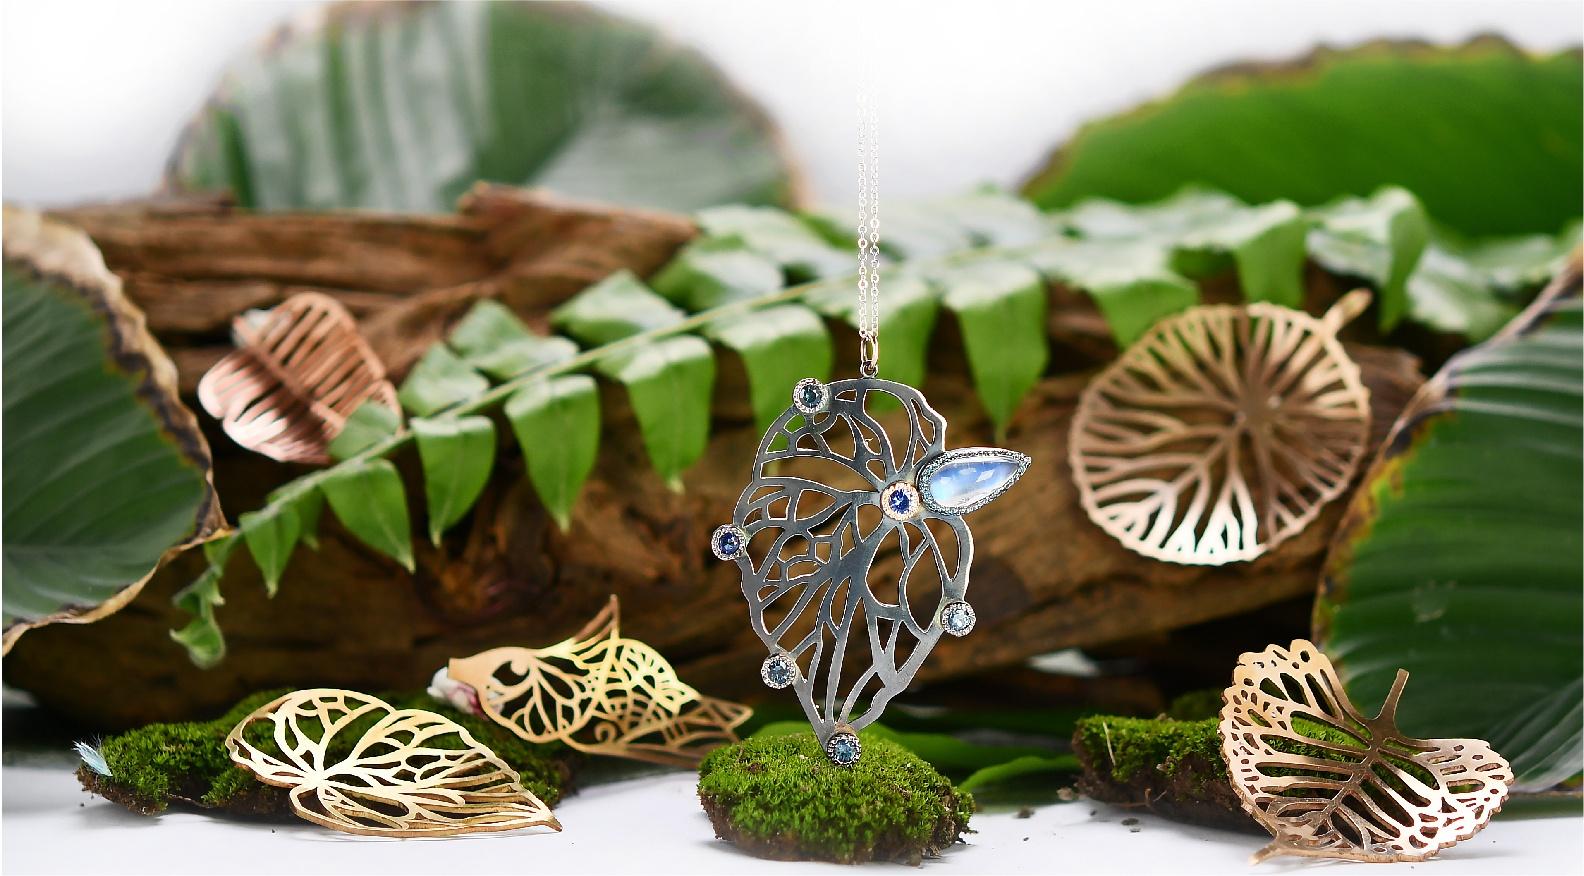 Botanical Template Pack